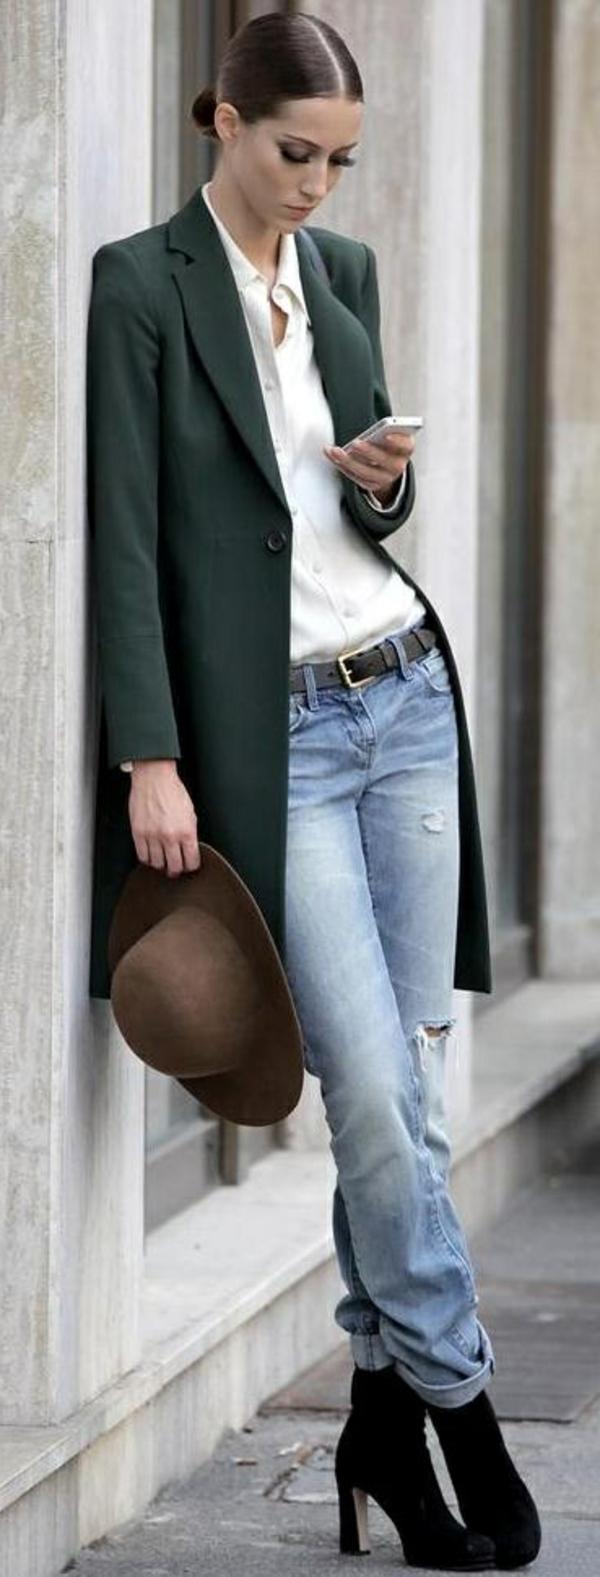 femme-jean-boyfriend-tenue-chic-botinettes